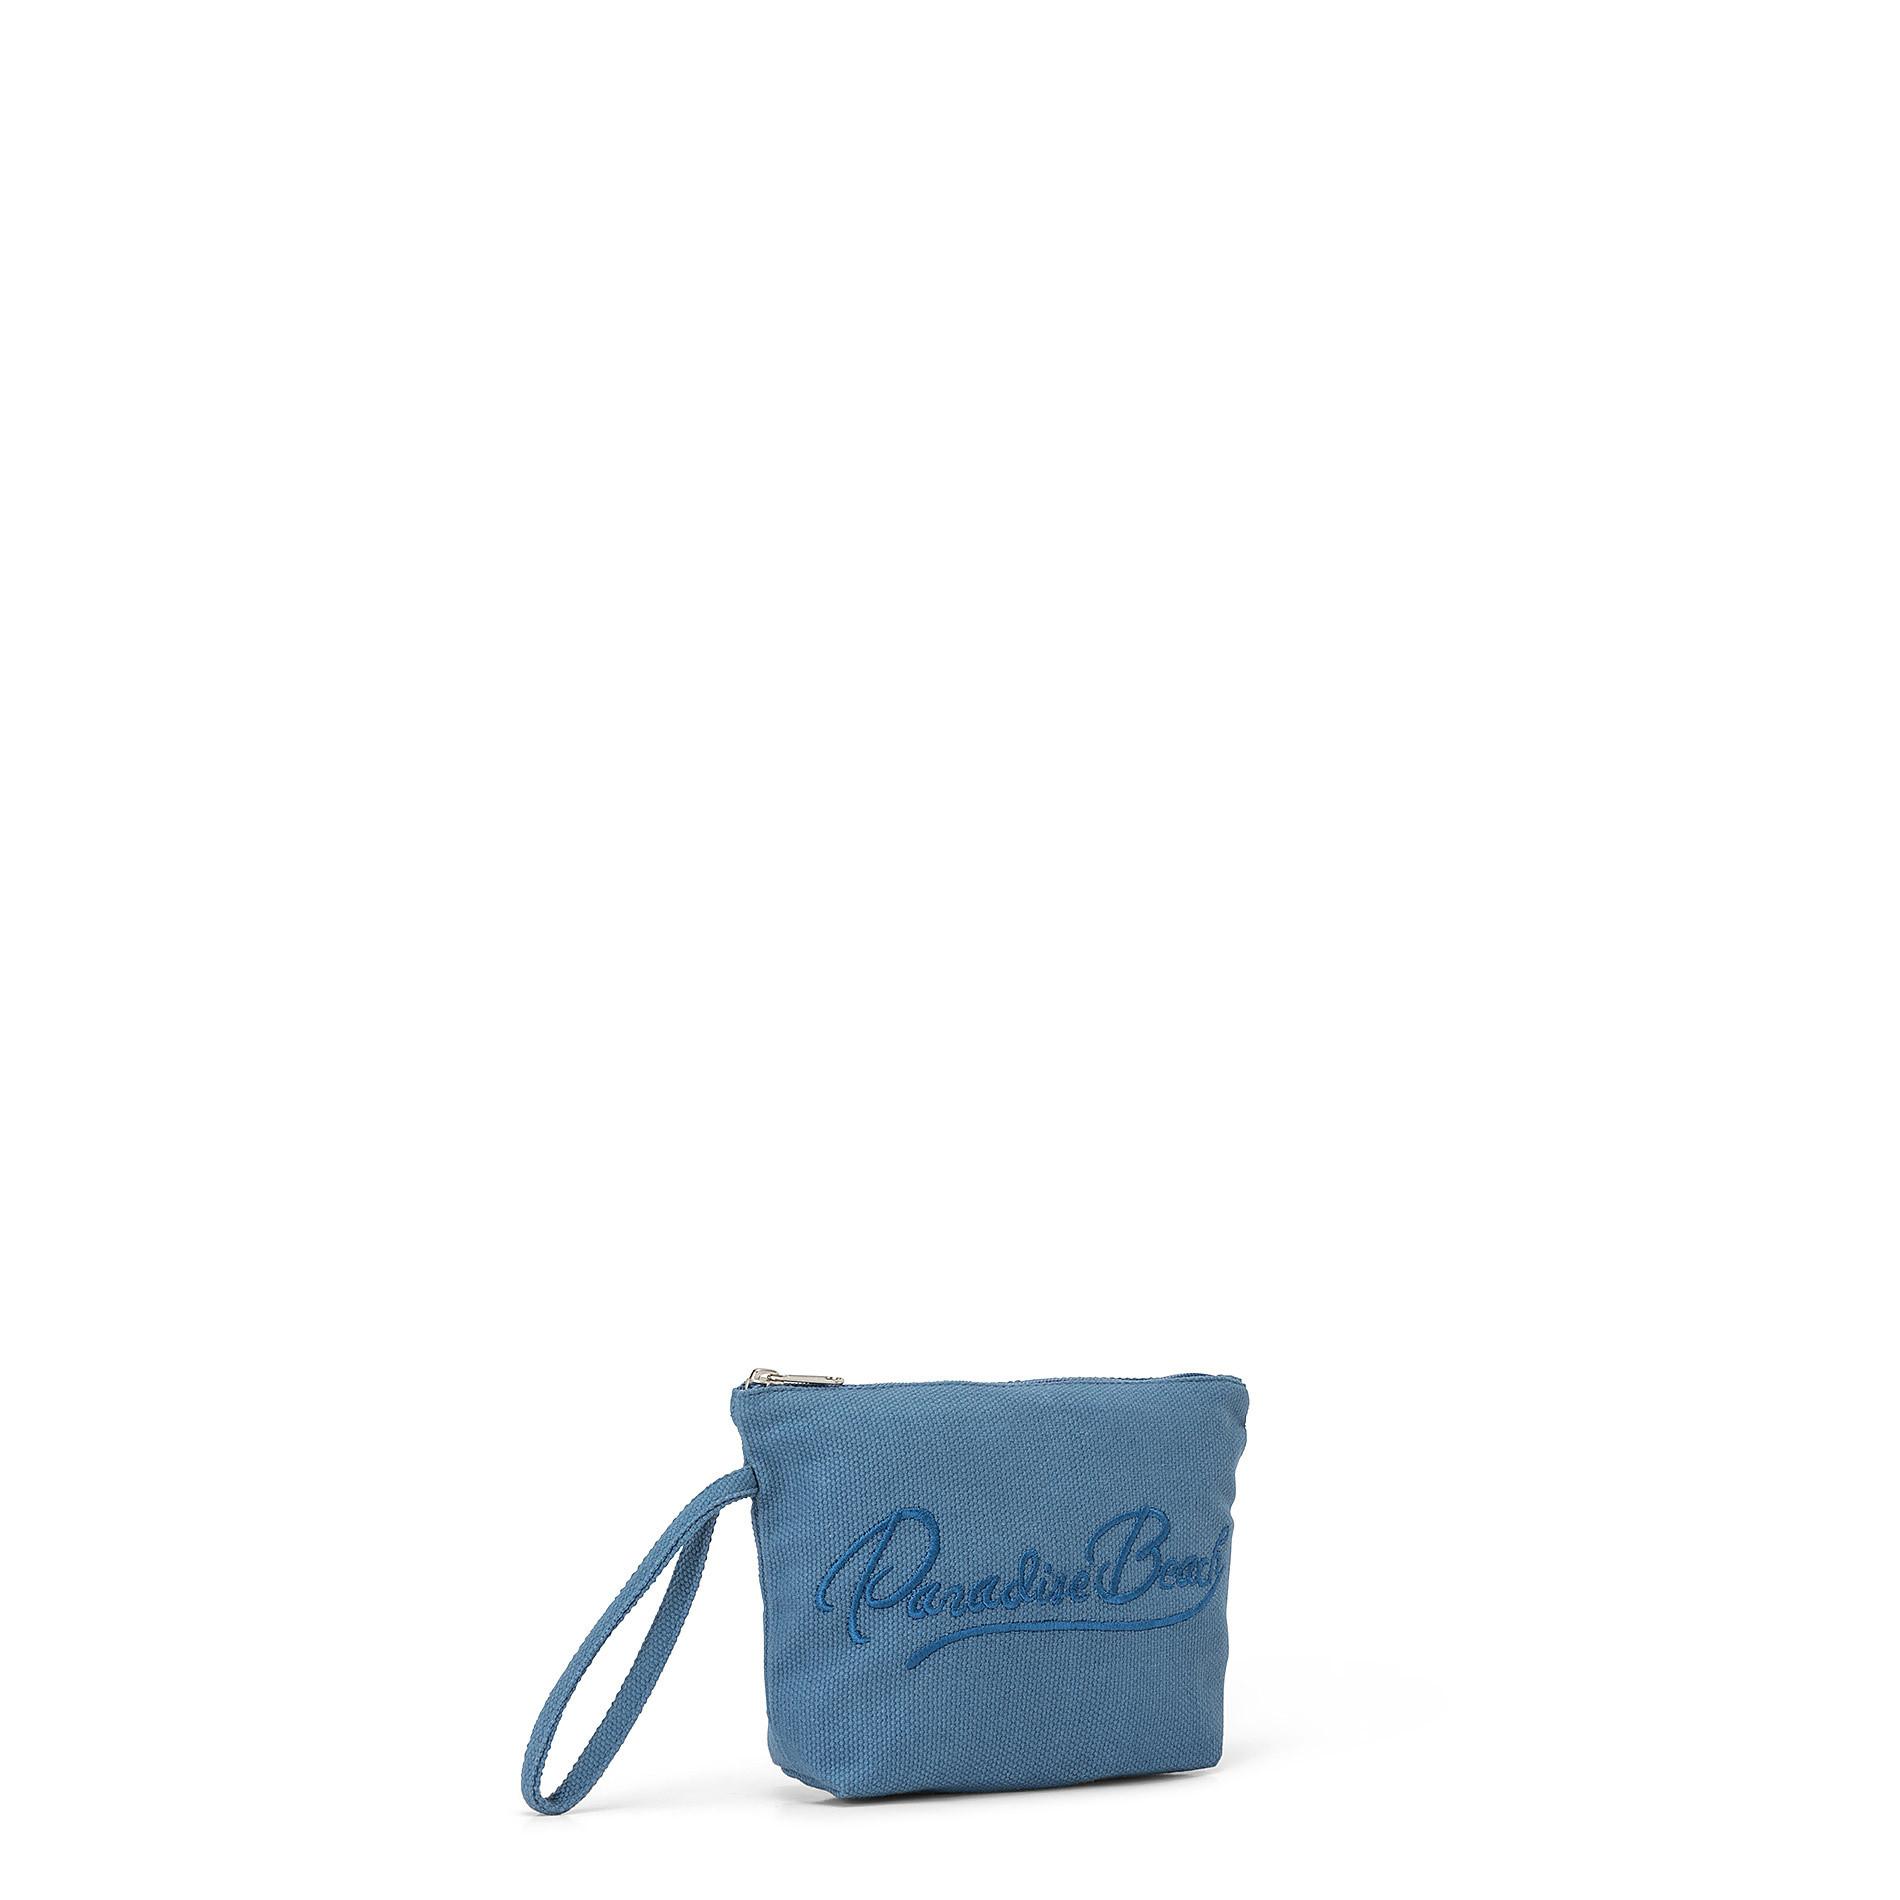 Bustina in canvas di cotone con ricamo, Blu, large image number 1